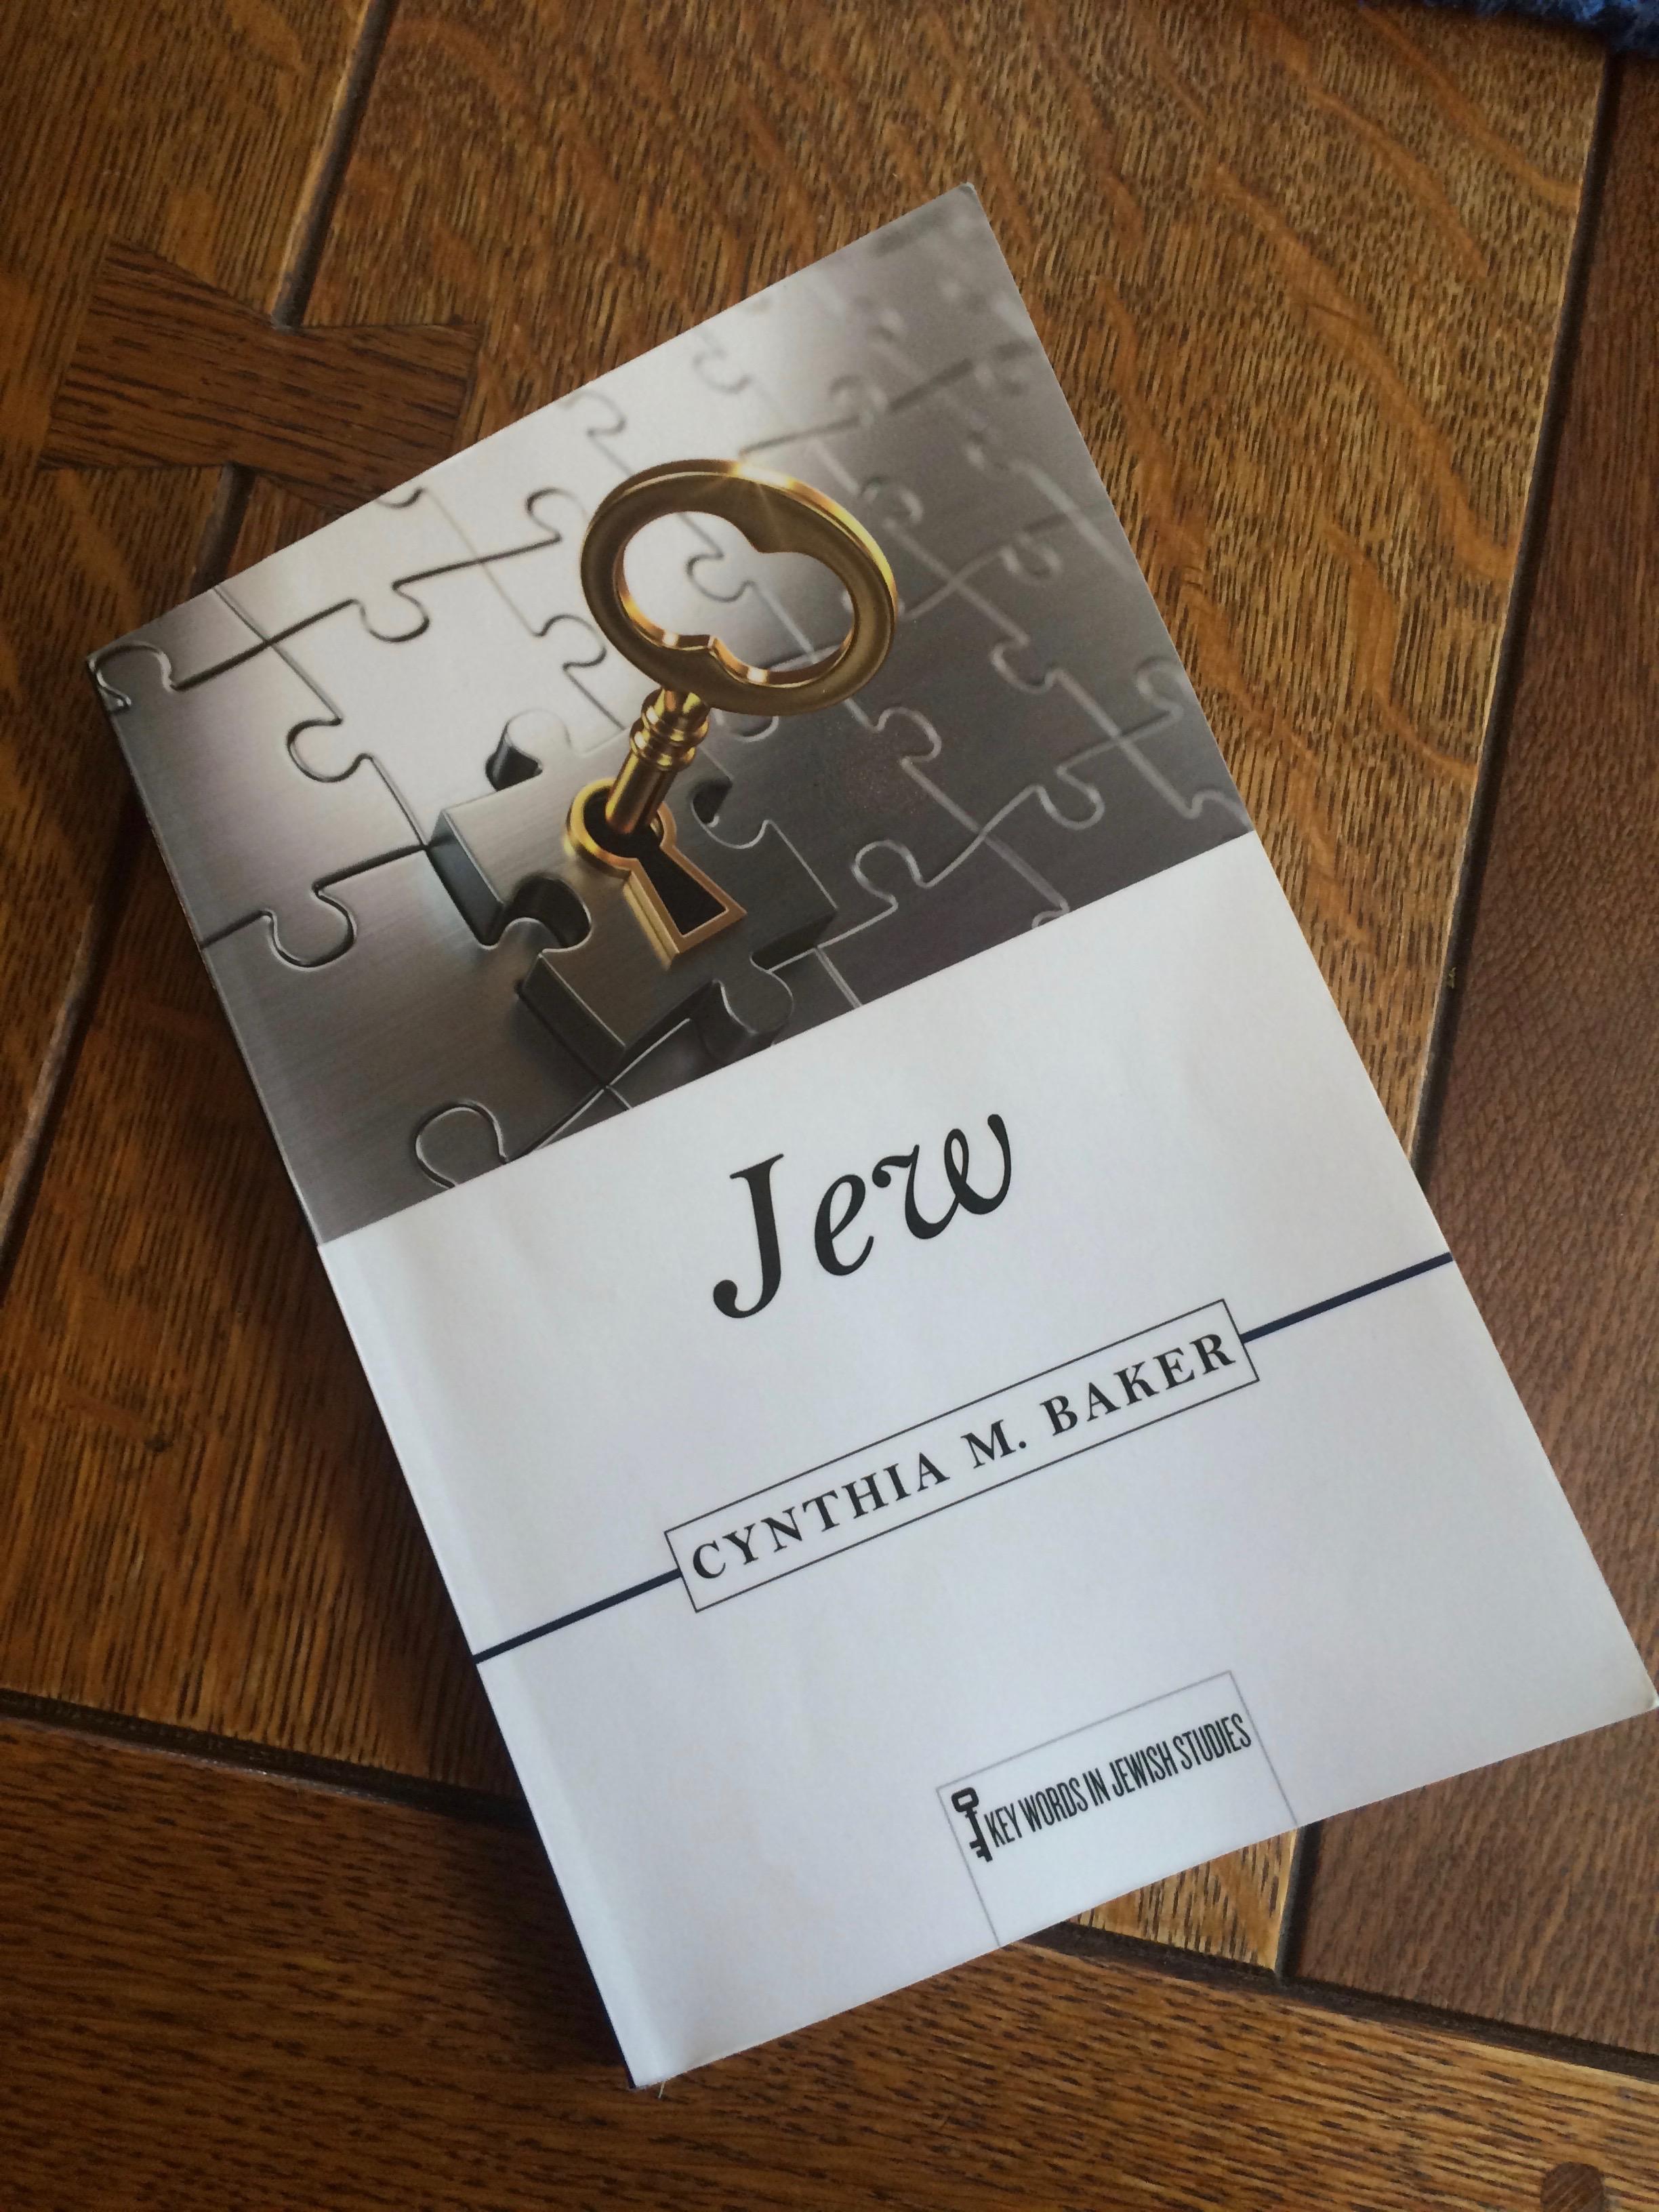 Jew by Cynthia M. Baker